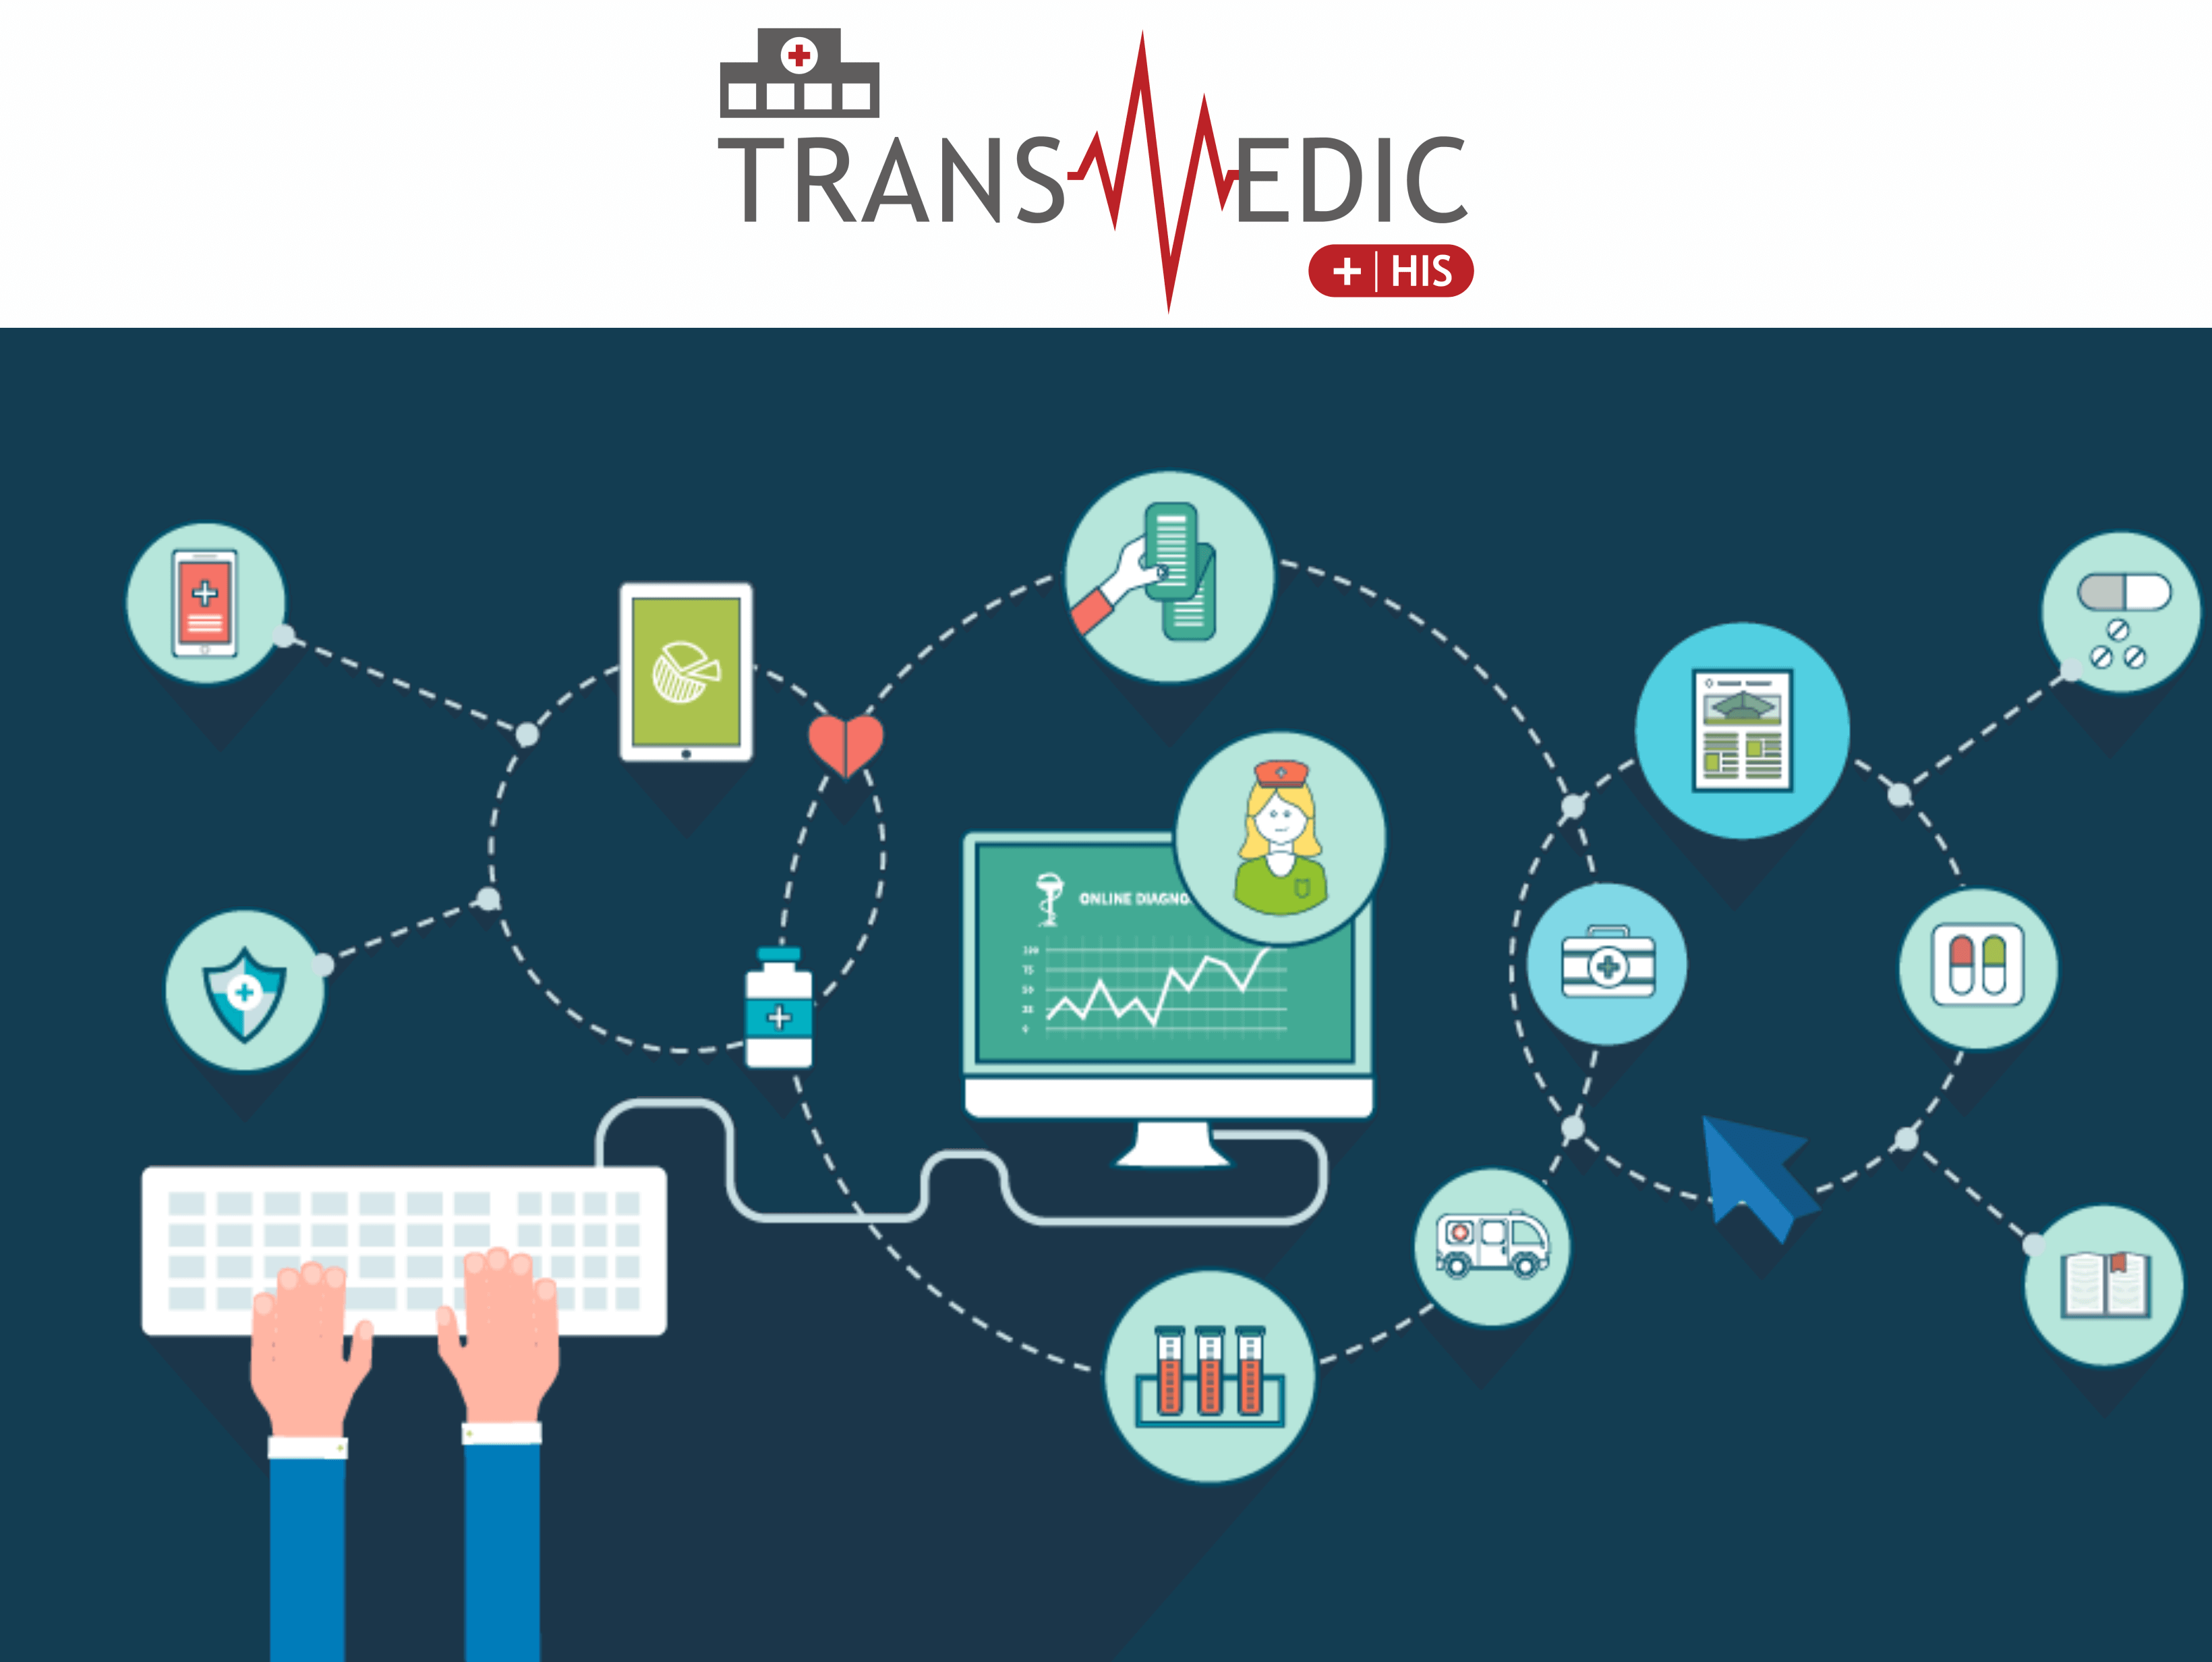 transmedic jasa pembuatan aplikasi simrs